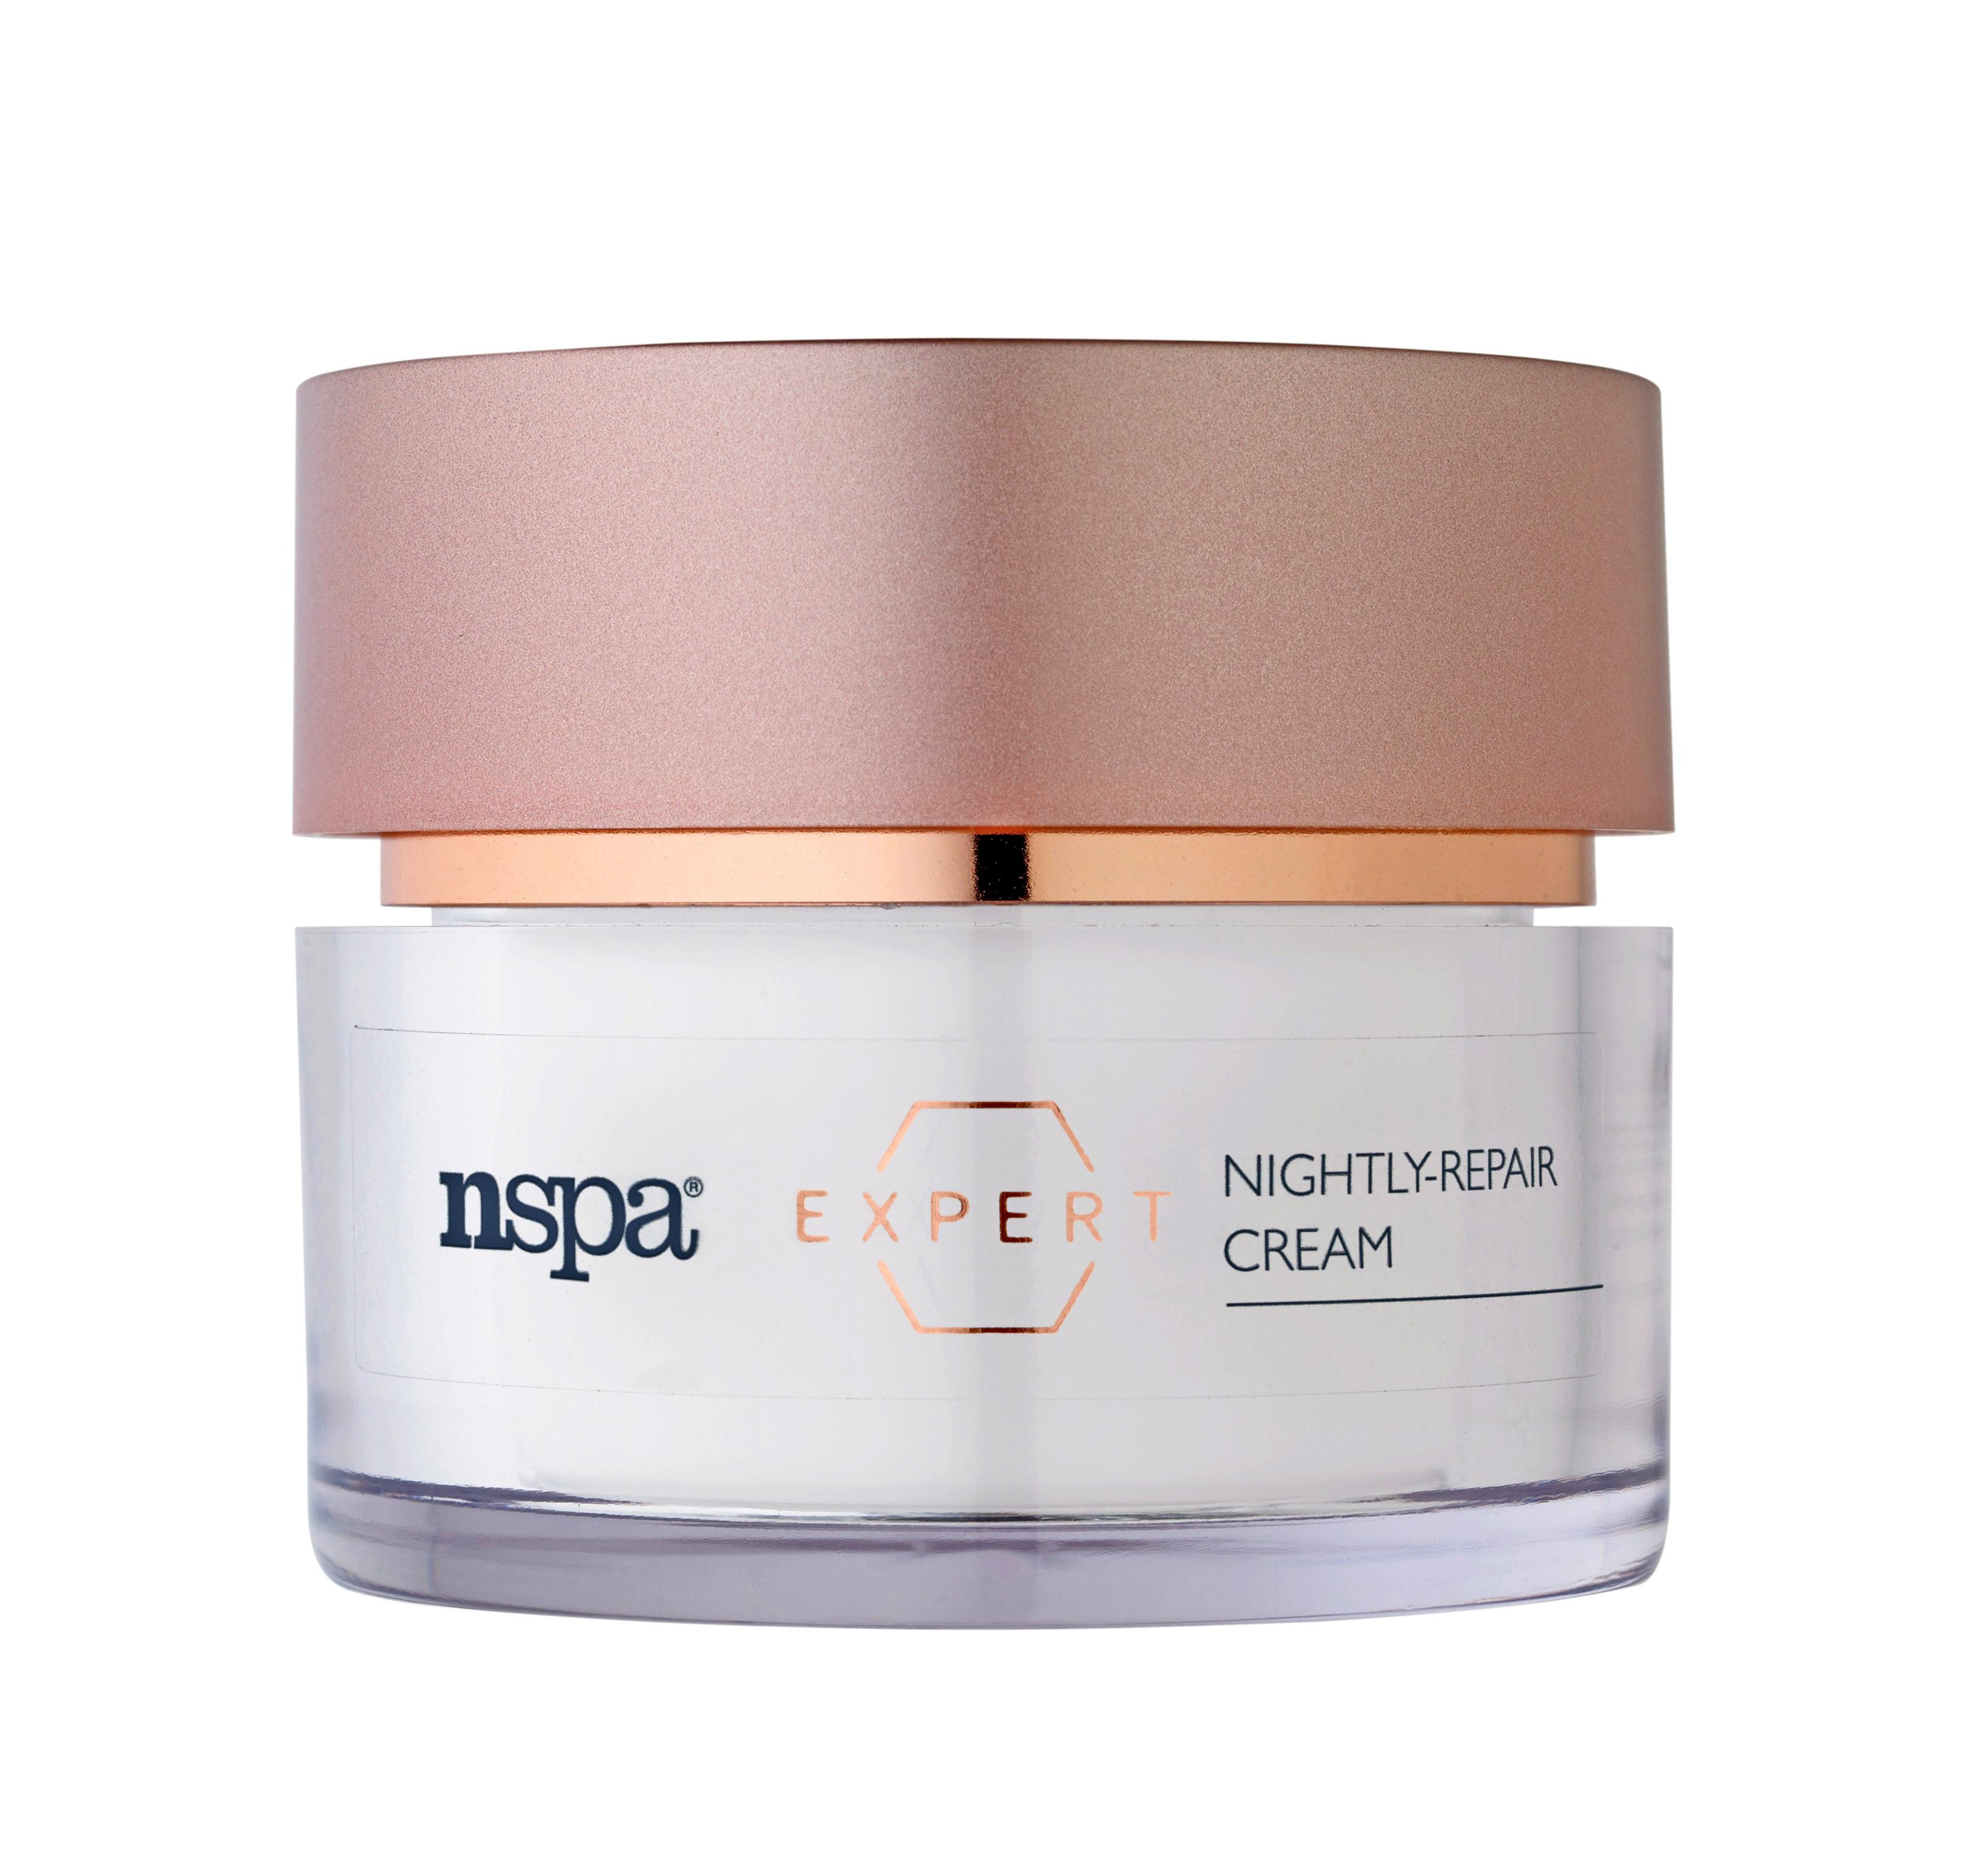 NSPA Expert Nightly Repair Cream